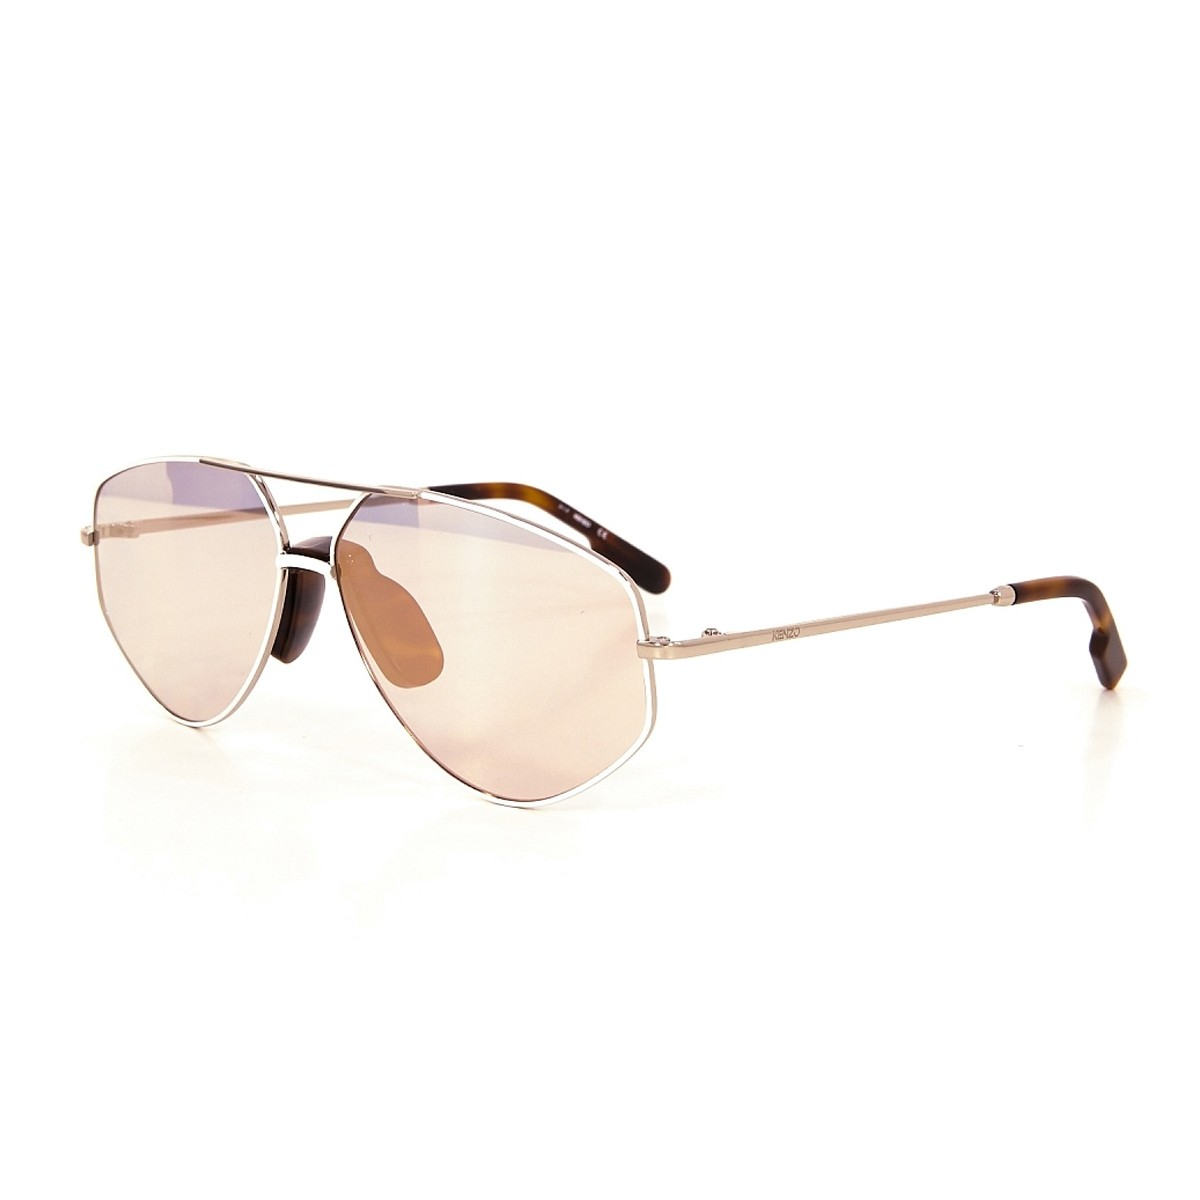 Kenzo KZ40014U | Unisex sunglasses